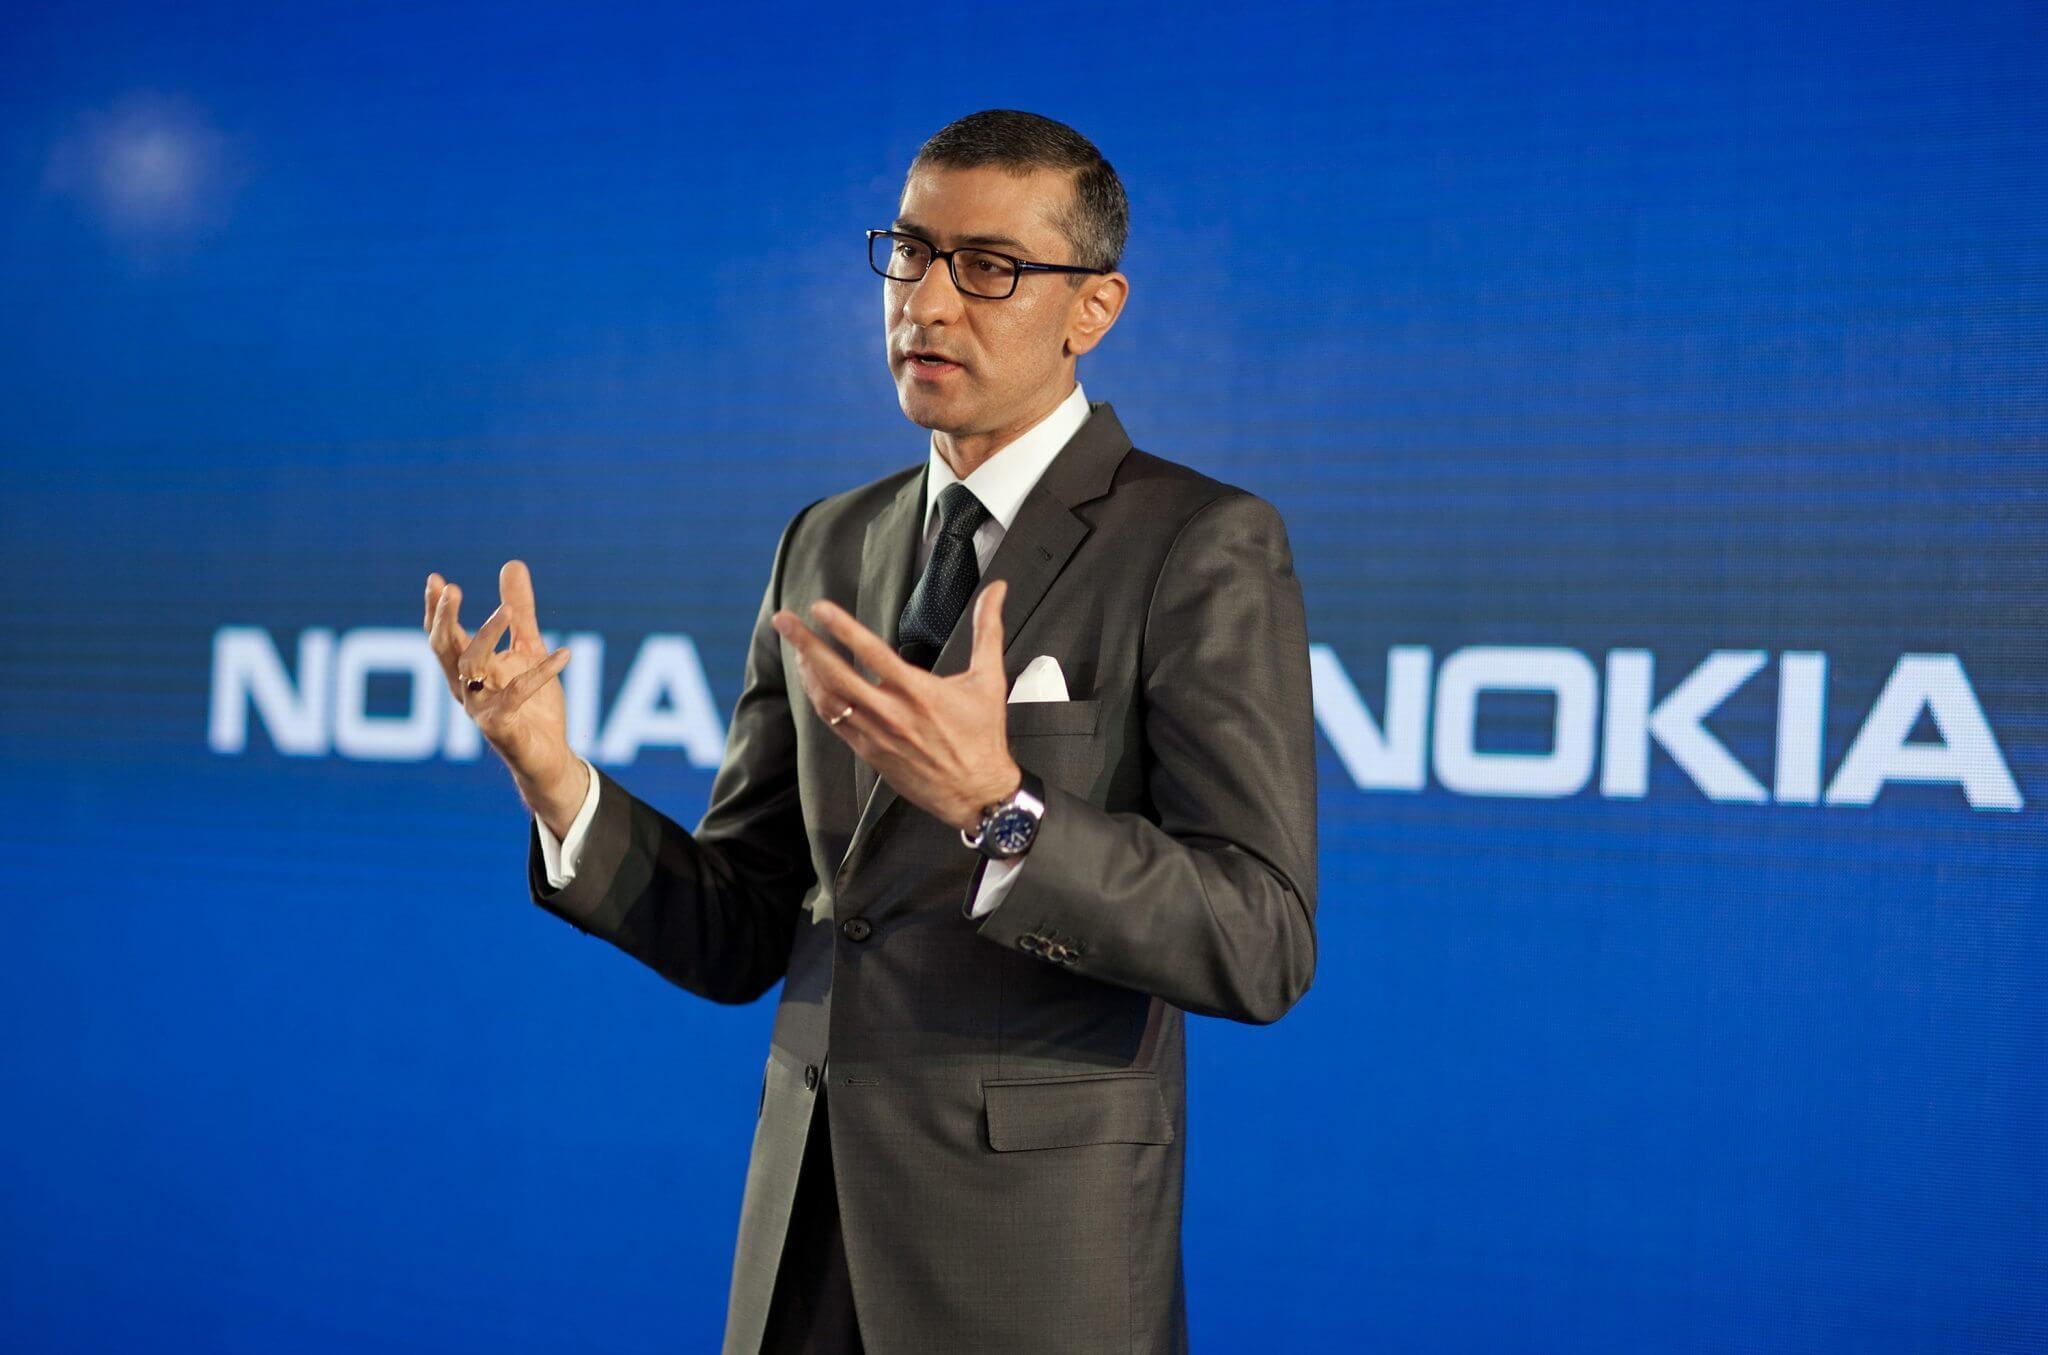 Rajeev Suri, CEO da Nokia